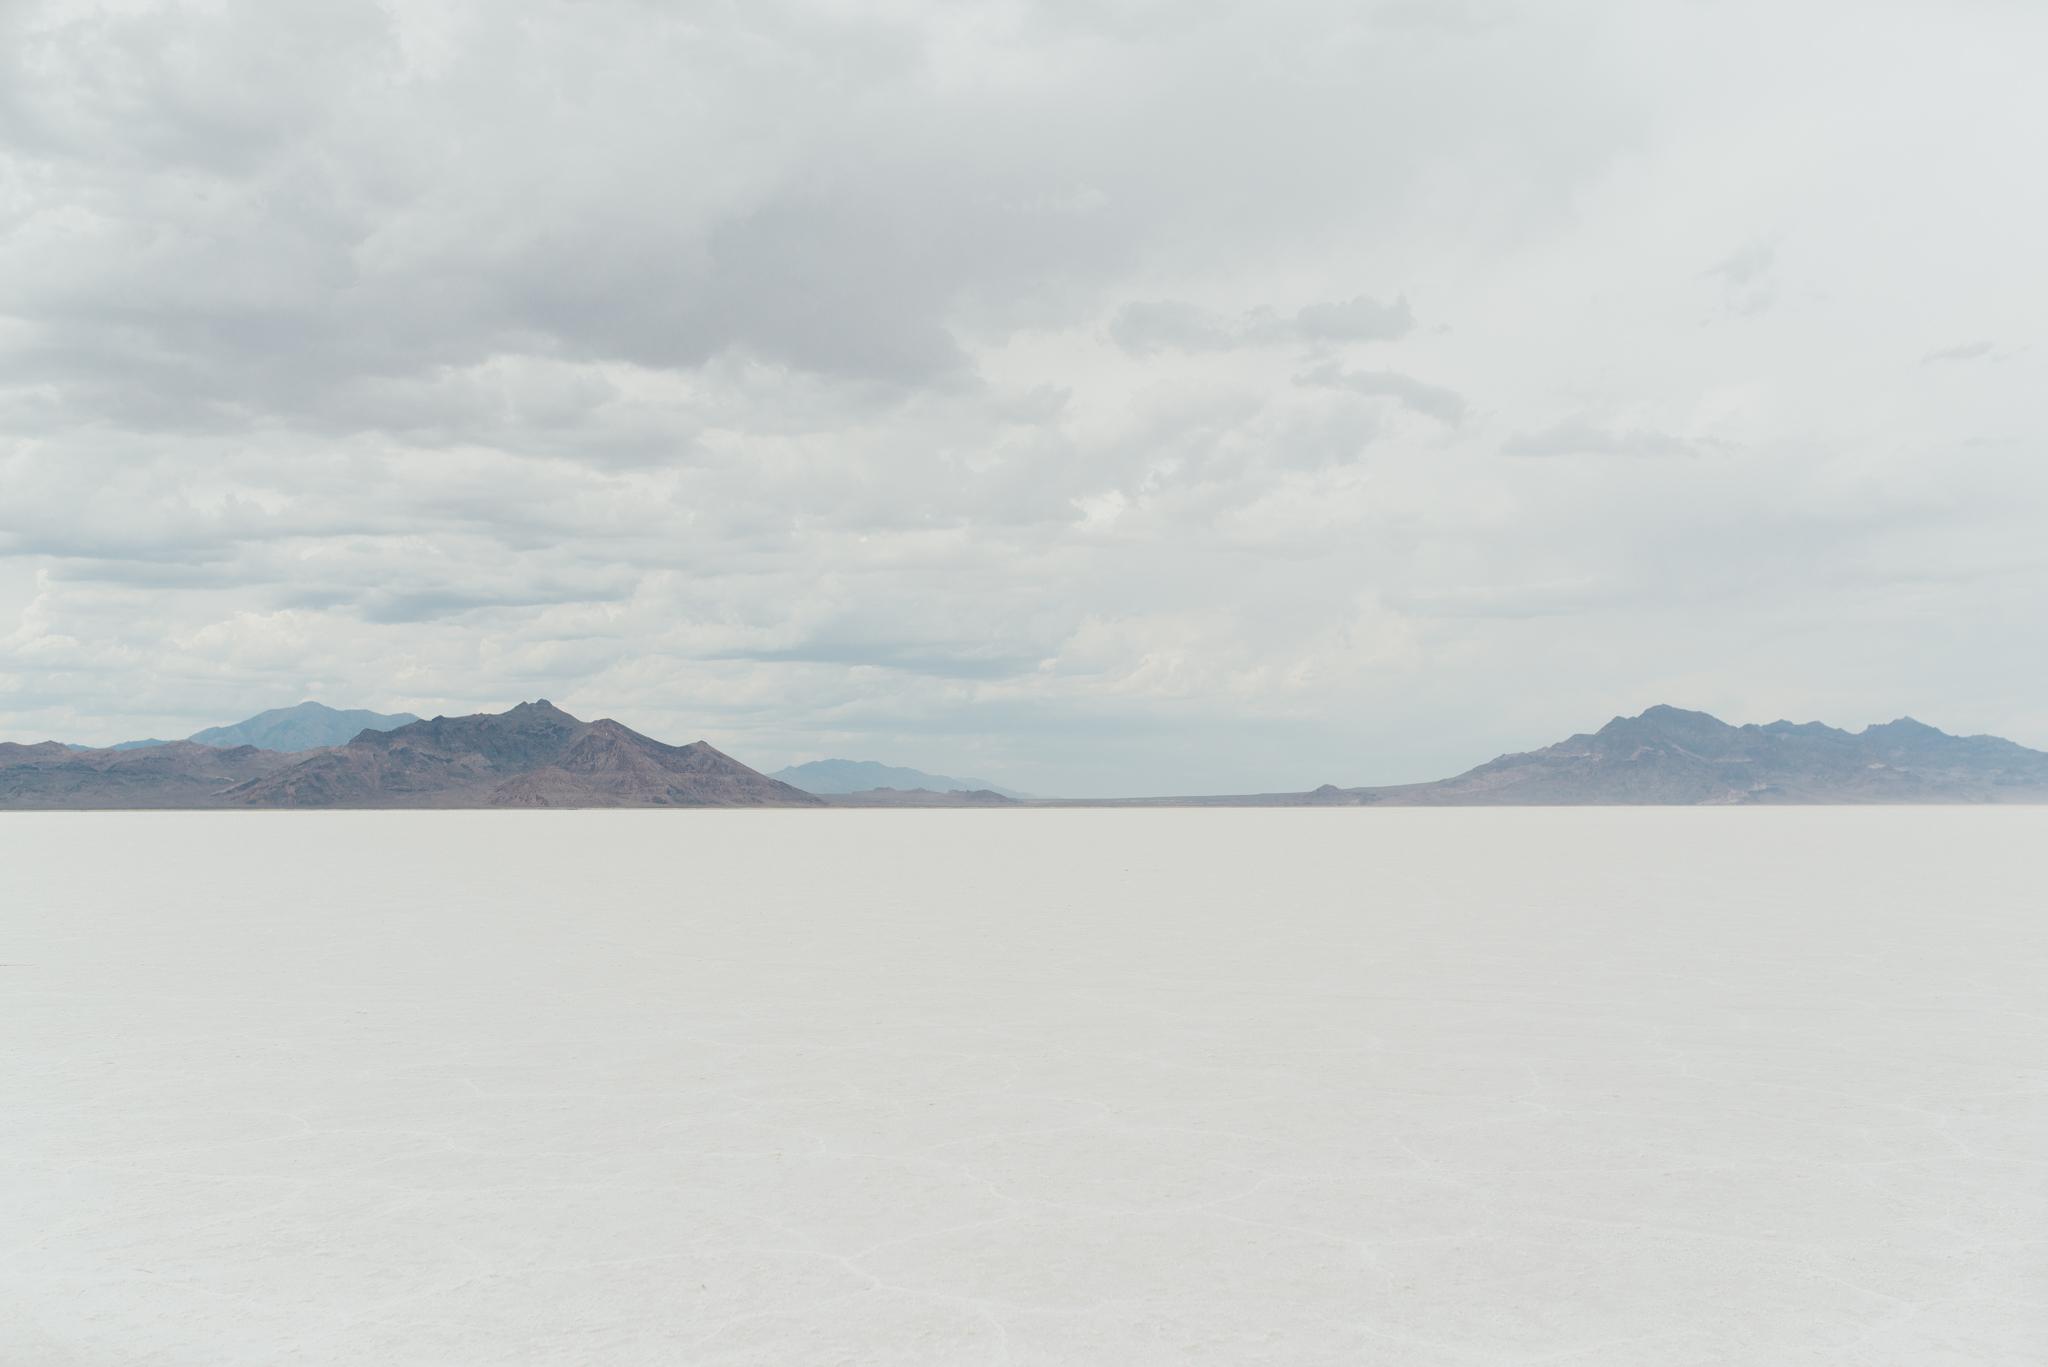 Utah 2015 (5 of 16).jpg